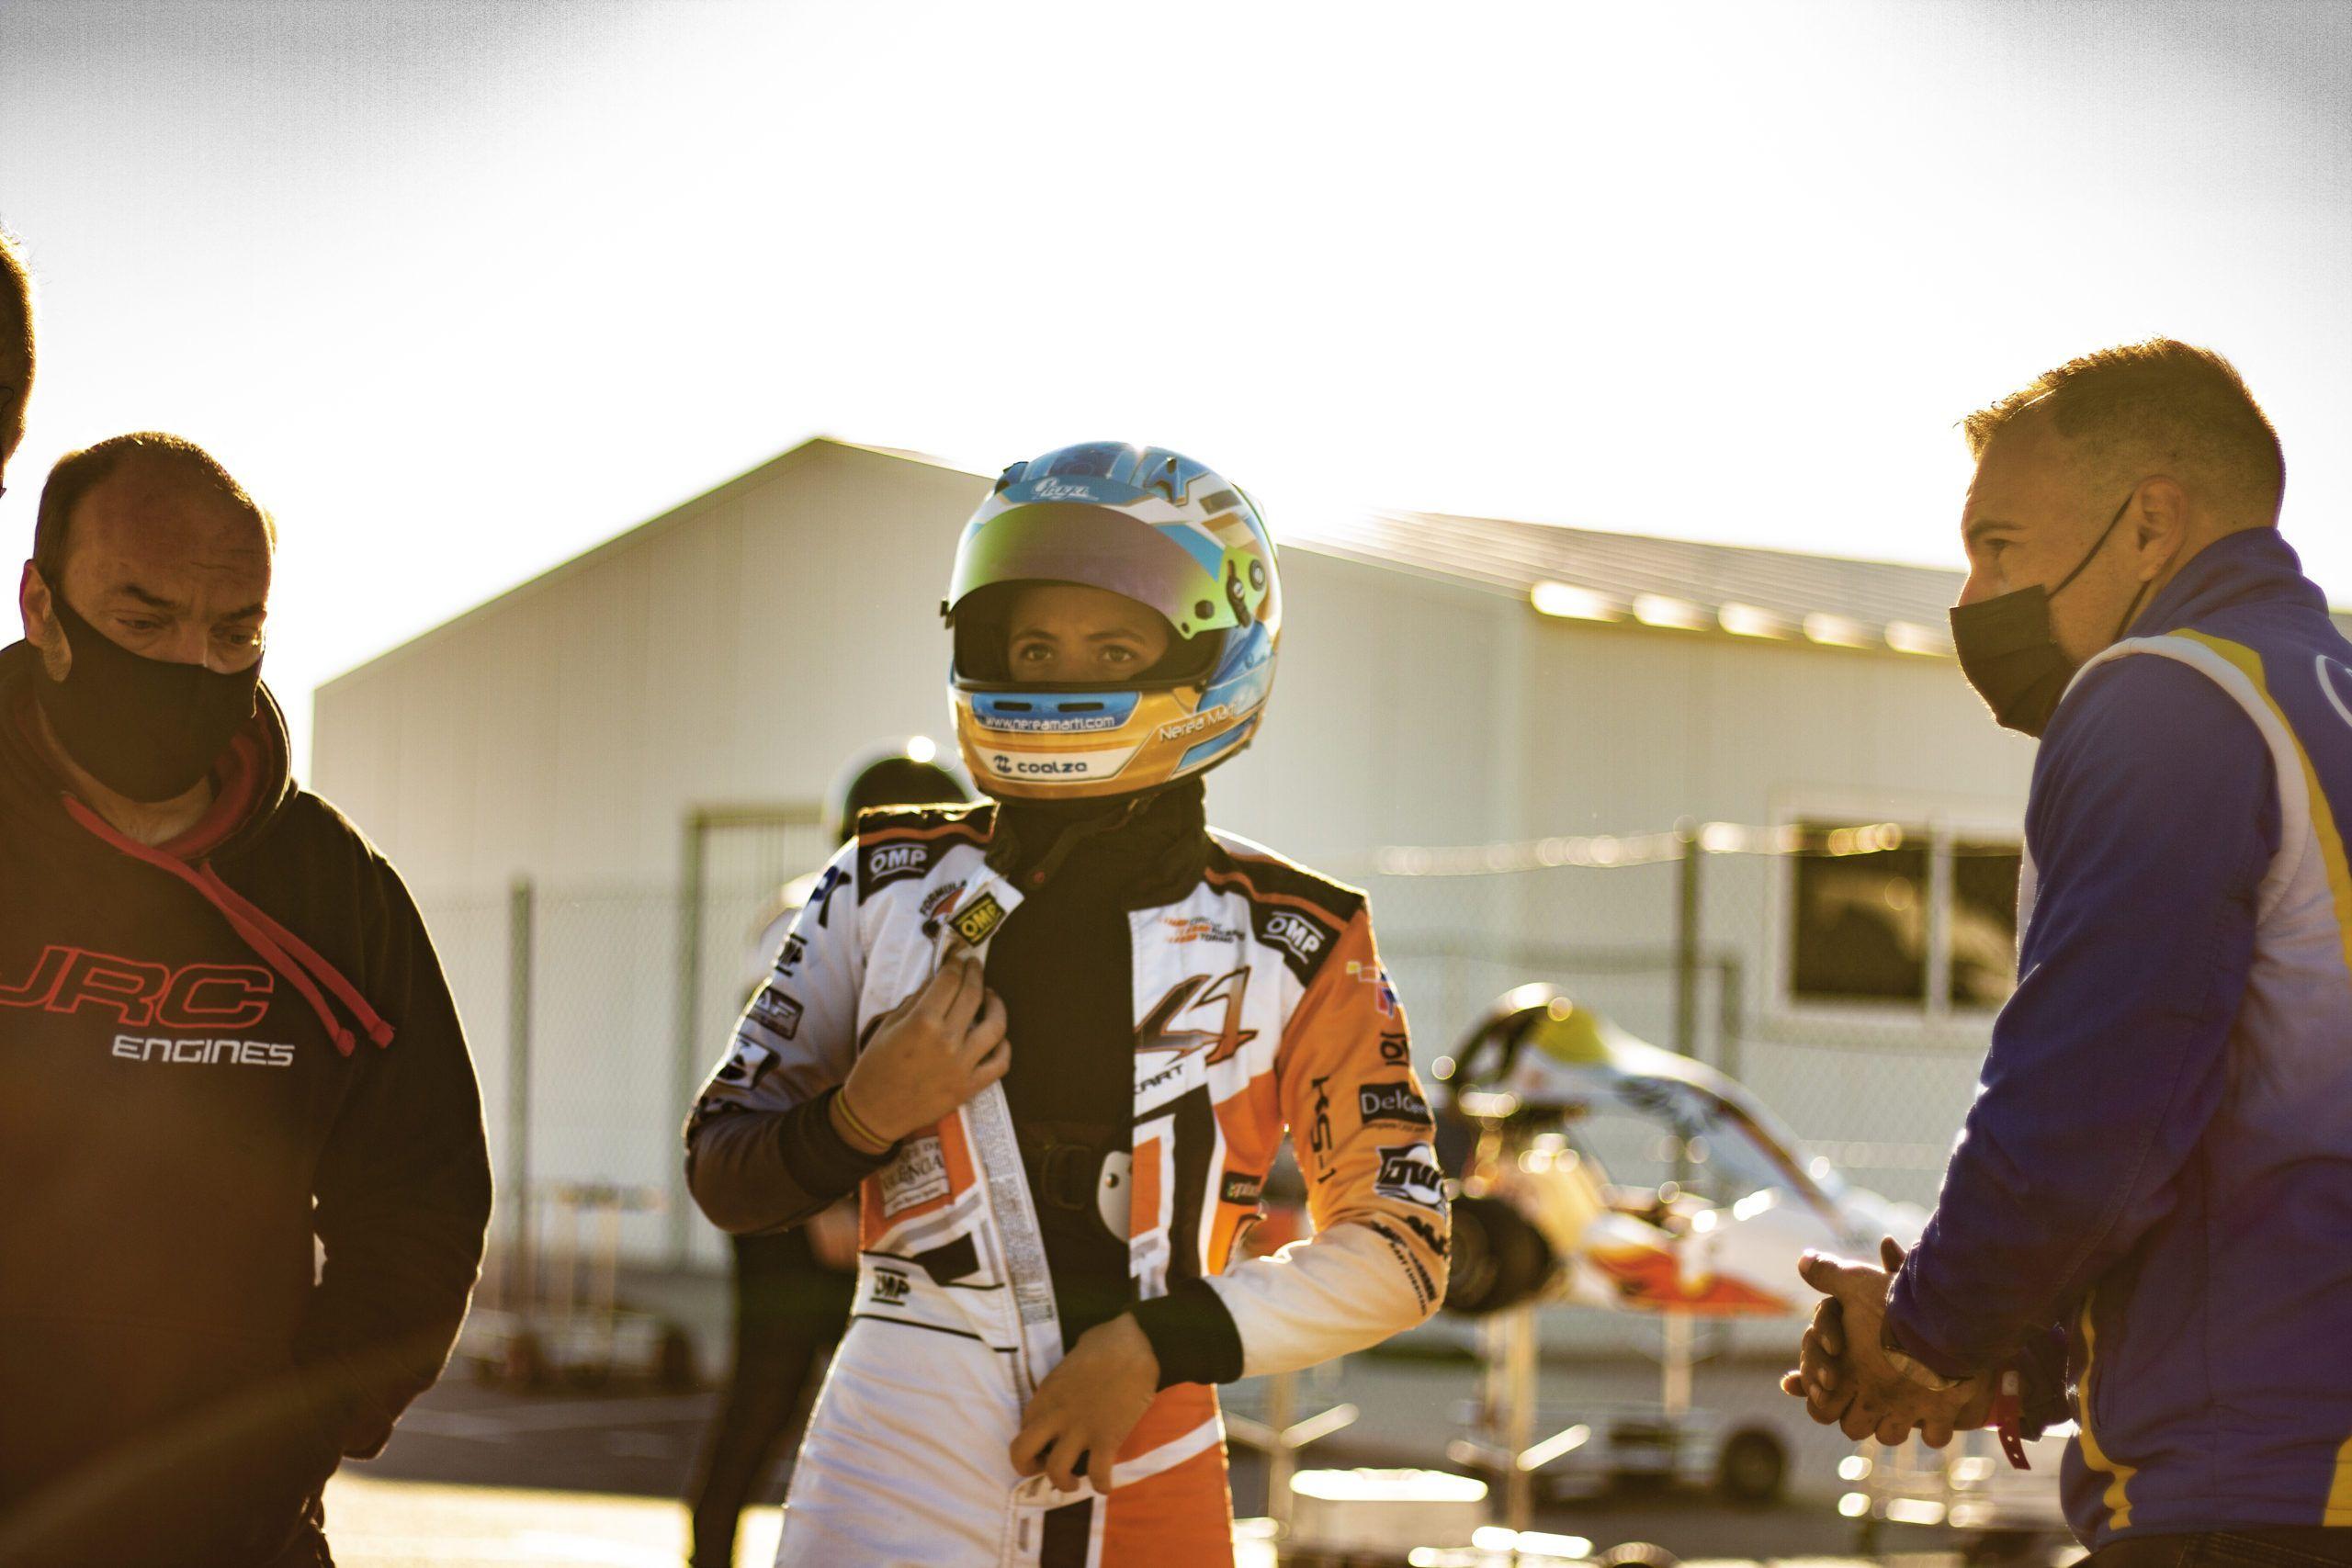 Nerea Martí, Praga España Motorsport